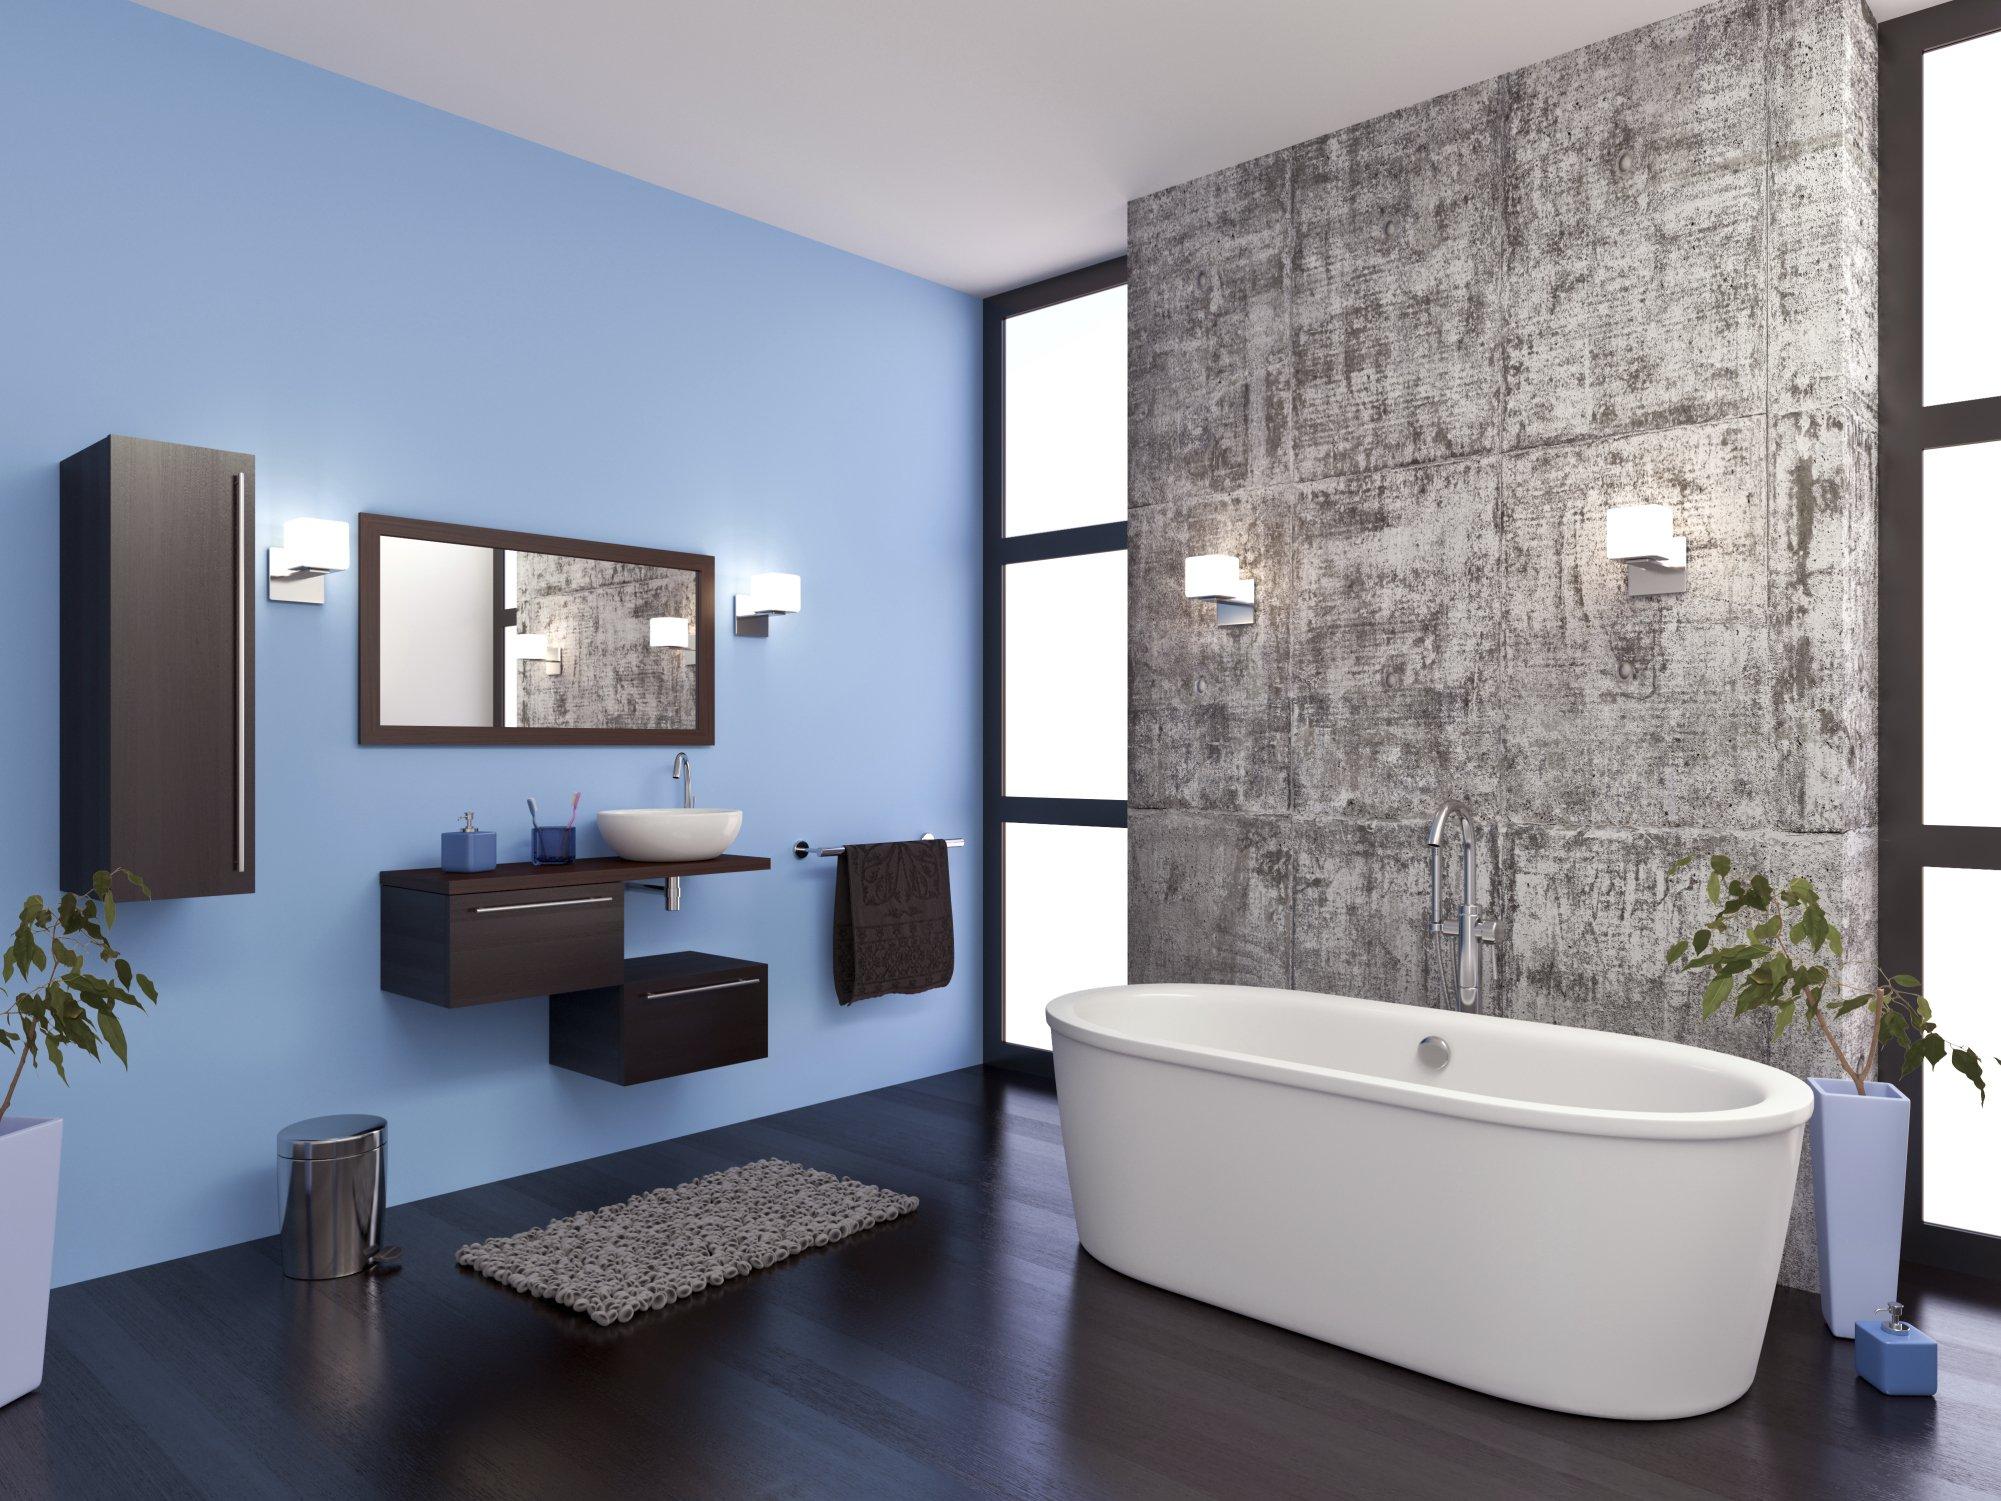 chattanooga remodeling b toms nj brick pogiraffe and tile g bathroom p llc river l us dipyridamole tn tiling